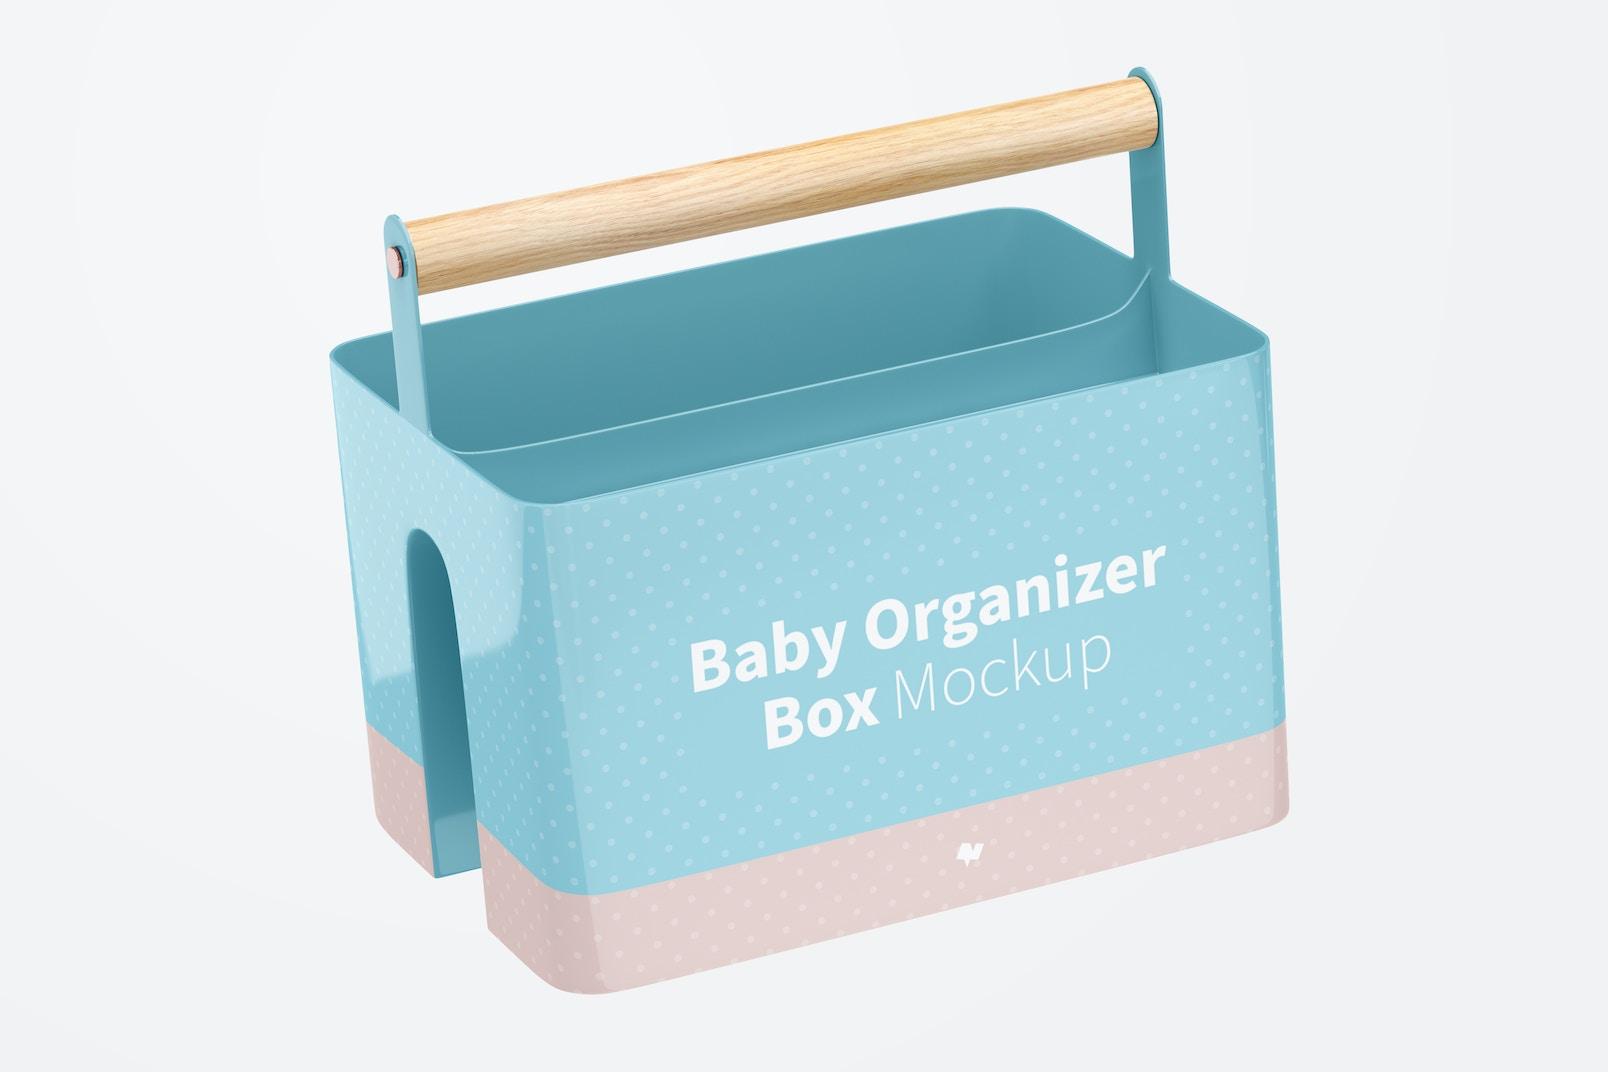 Baby Organizer Box Mockup, Falling